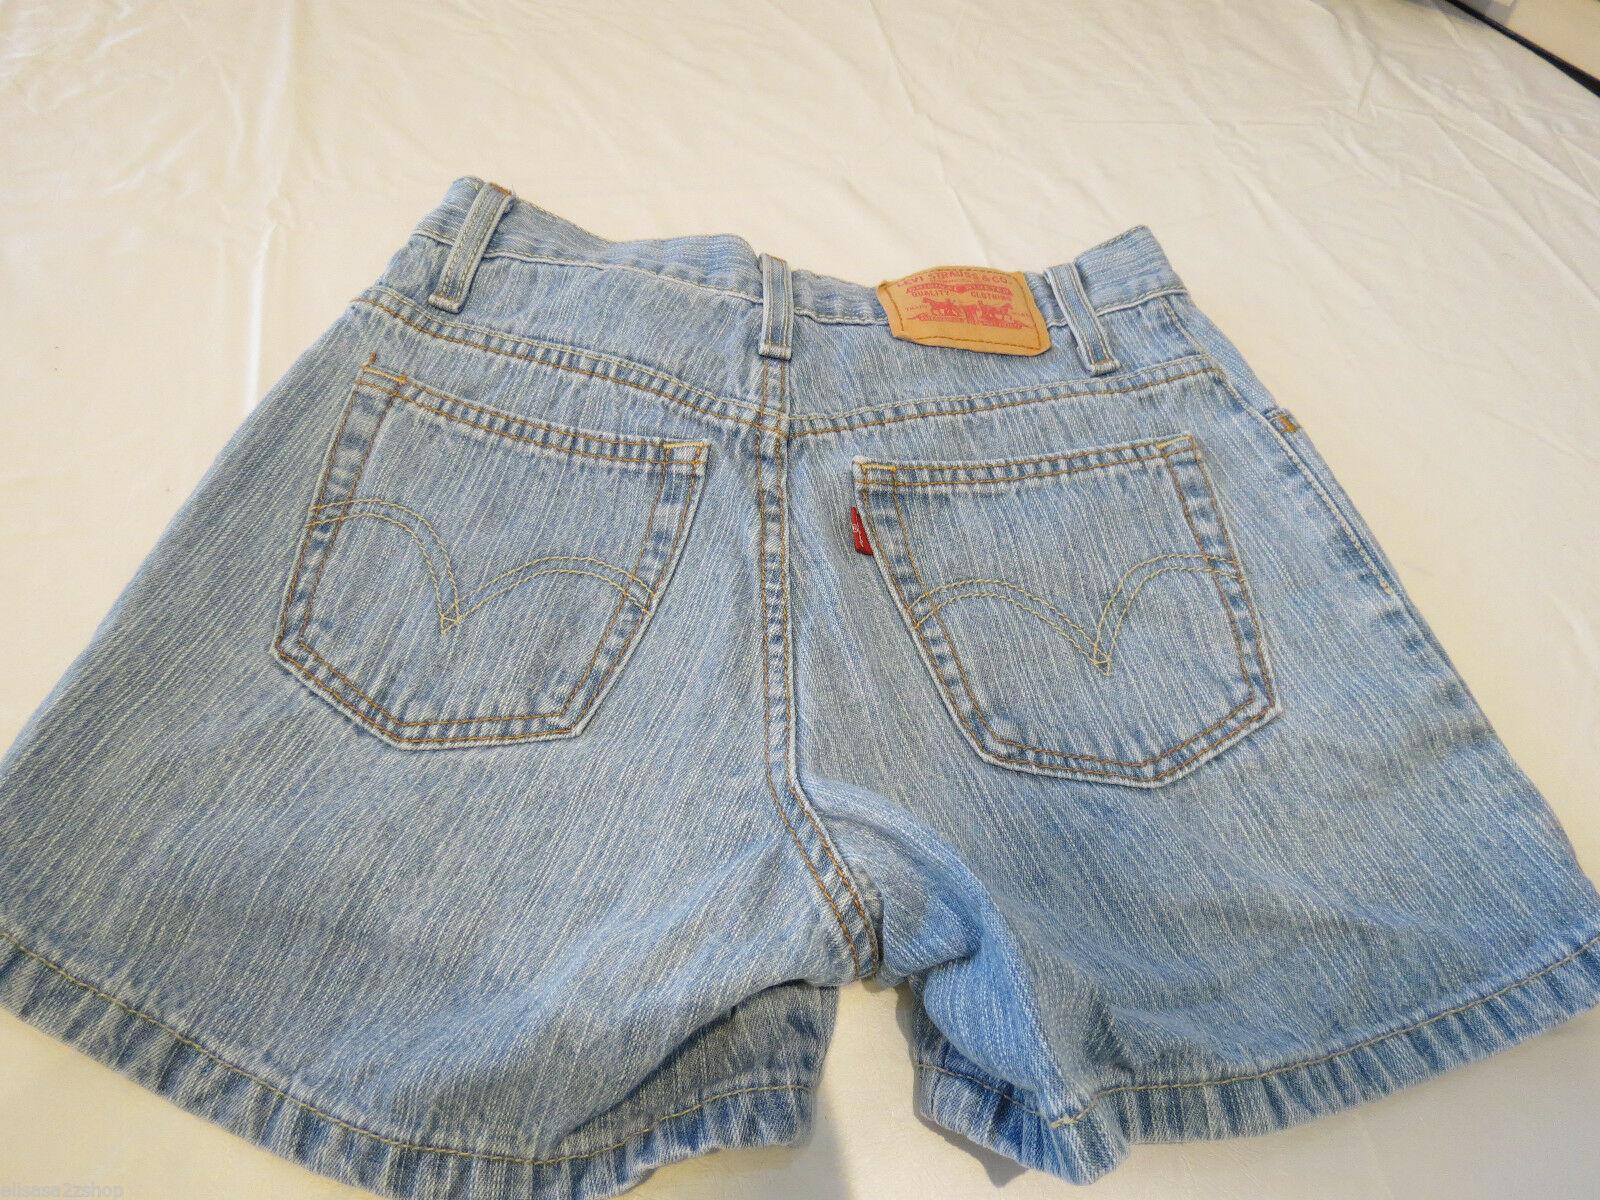 Levi's Niedrig 7 Blau Denim Shorts Junior Damen 731L 379556012 EUC #